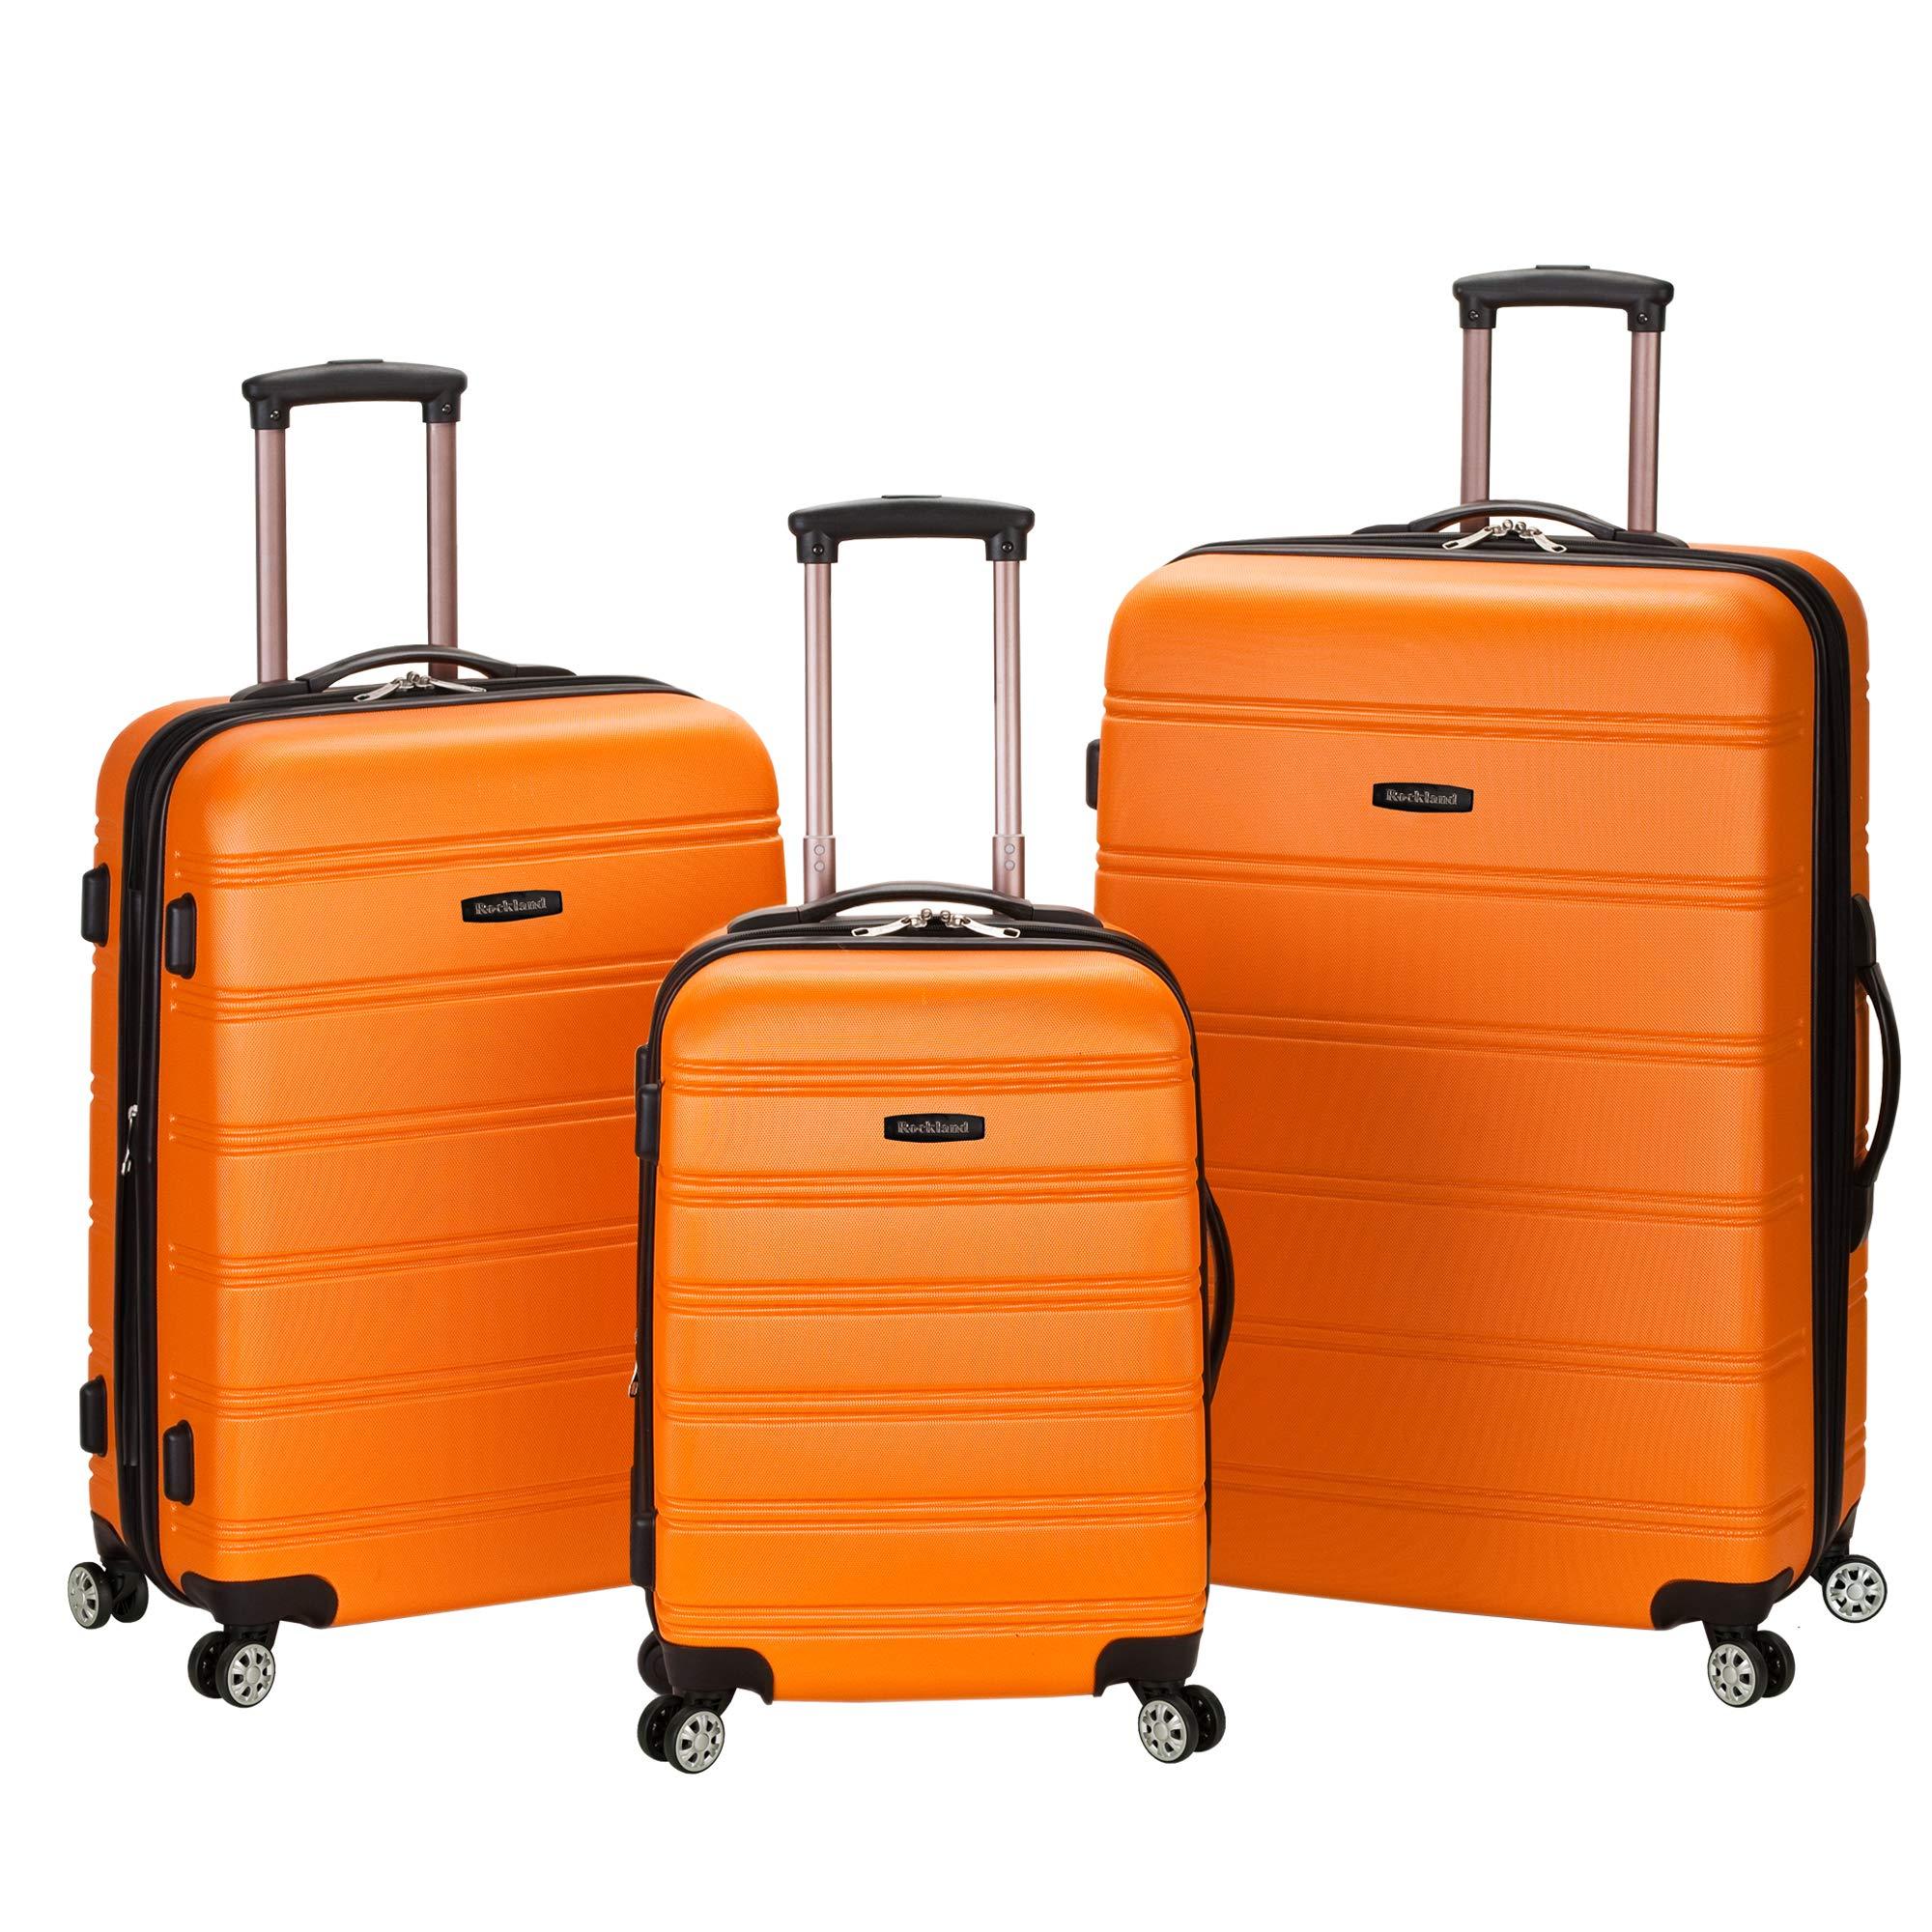 Rockland Melbourne 3 Pc Abs Luggage Set, Orange